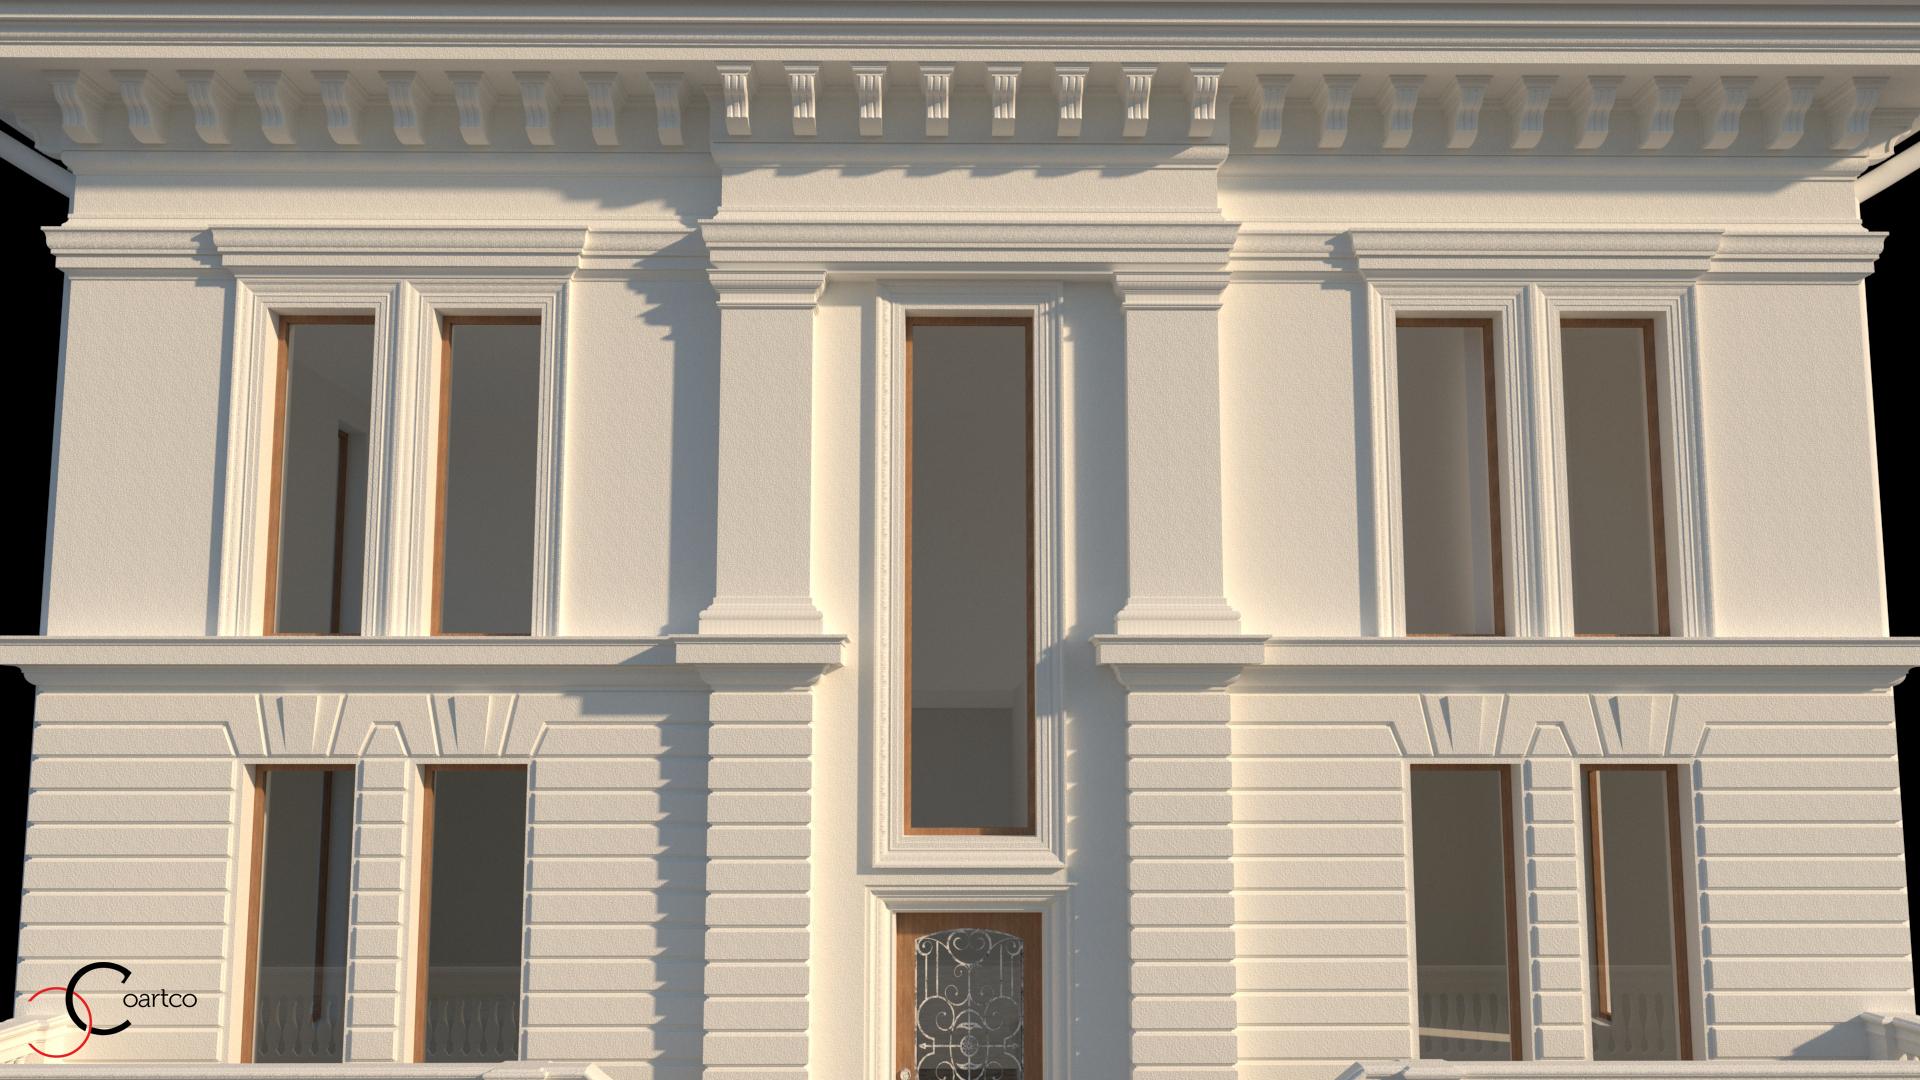 fatada-casa-proiect-design-realizat-de-coartco